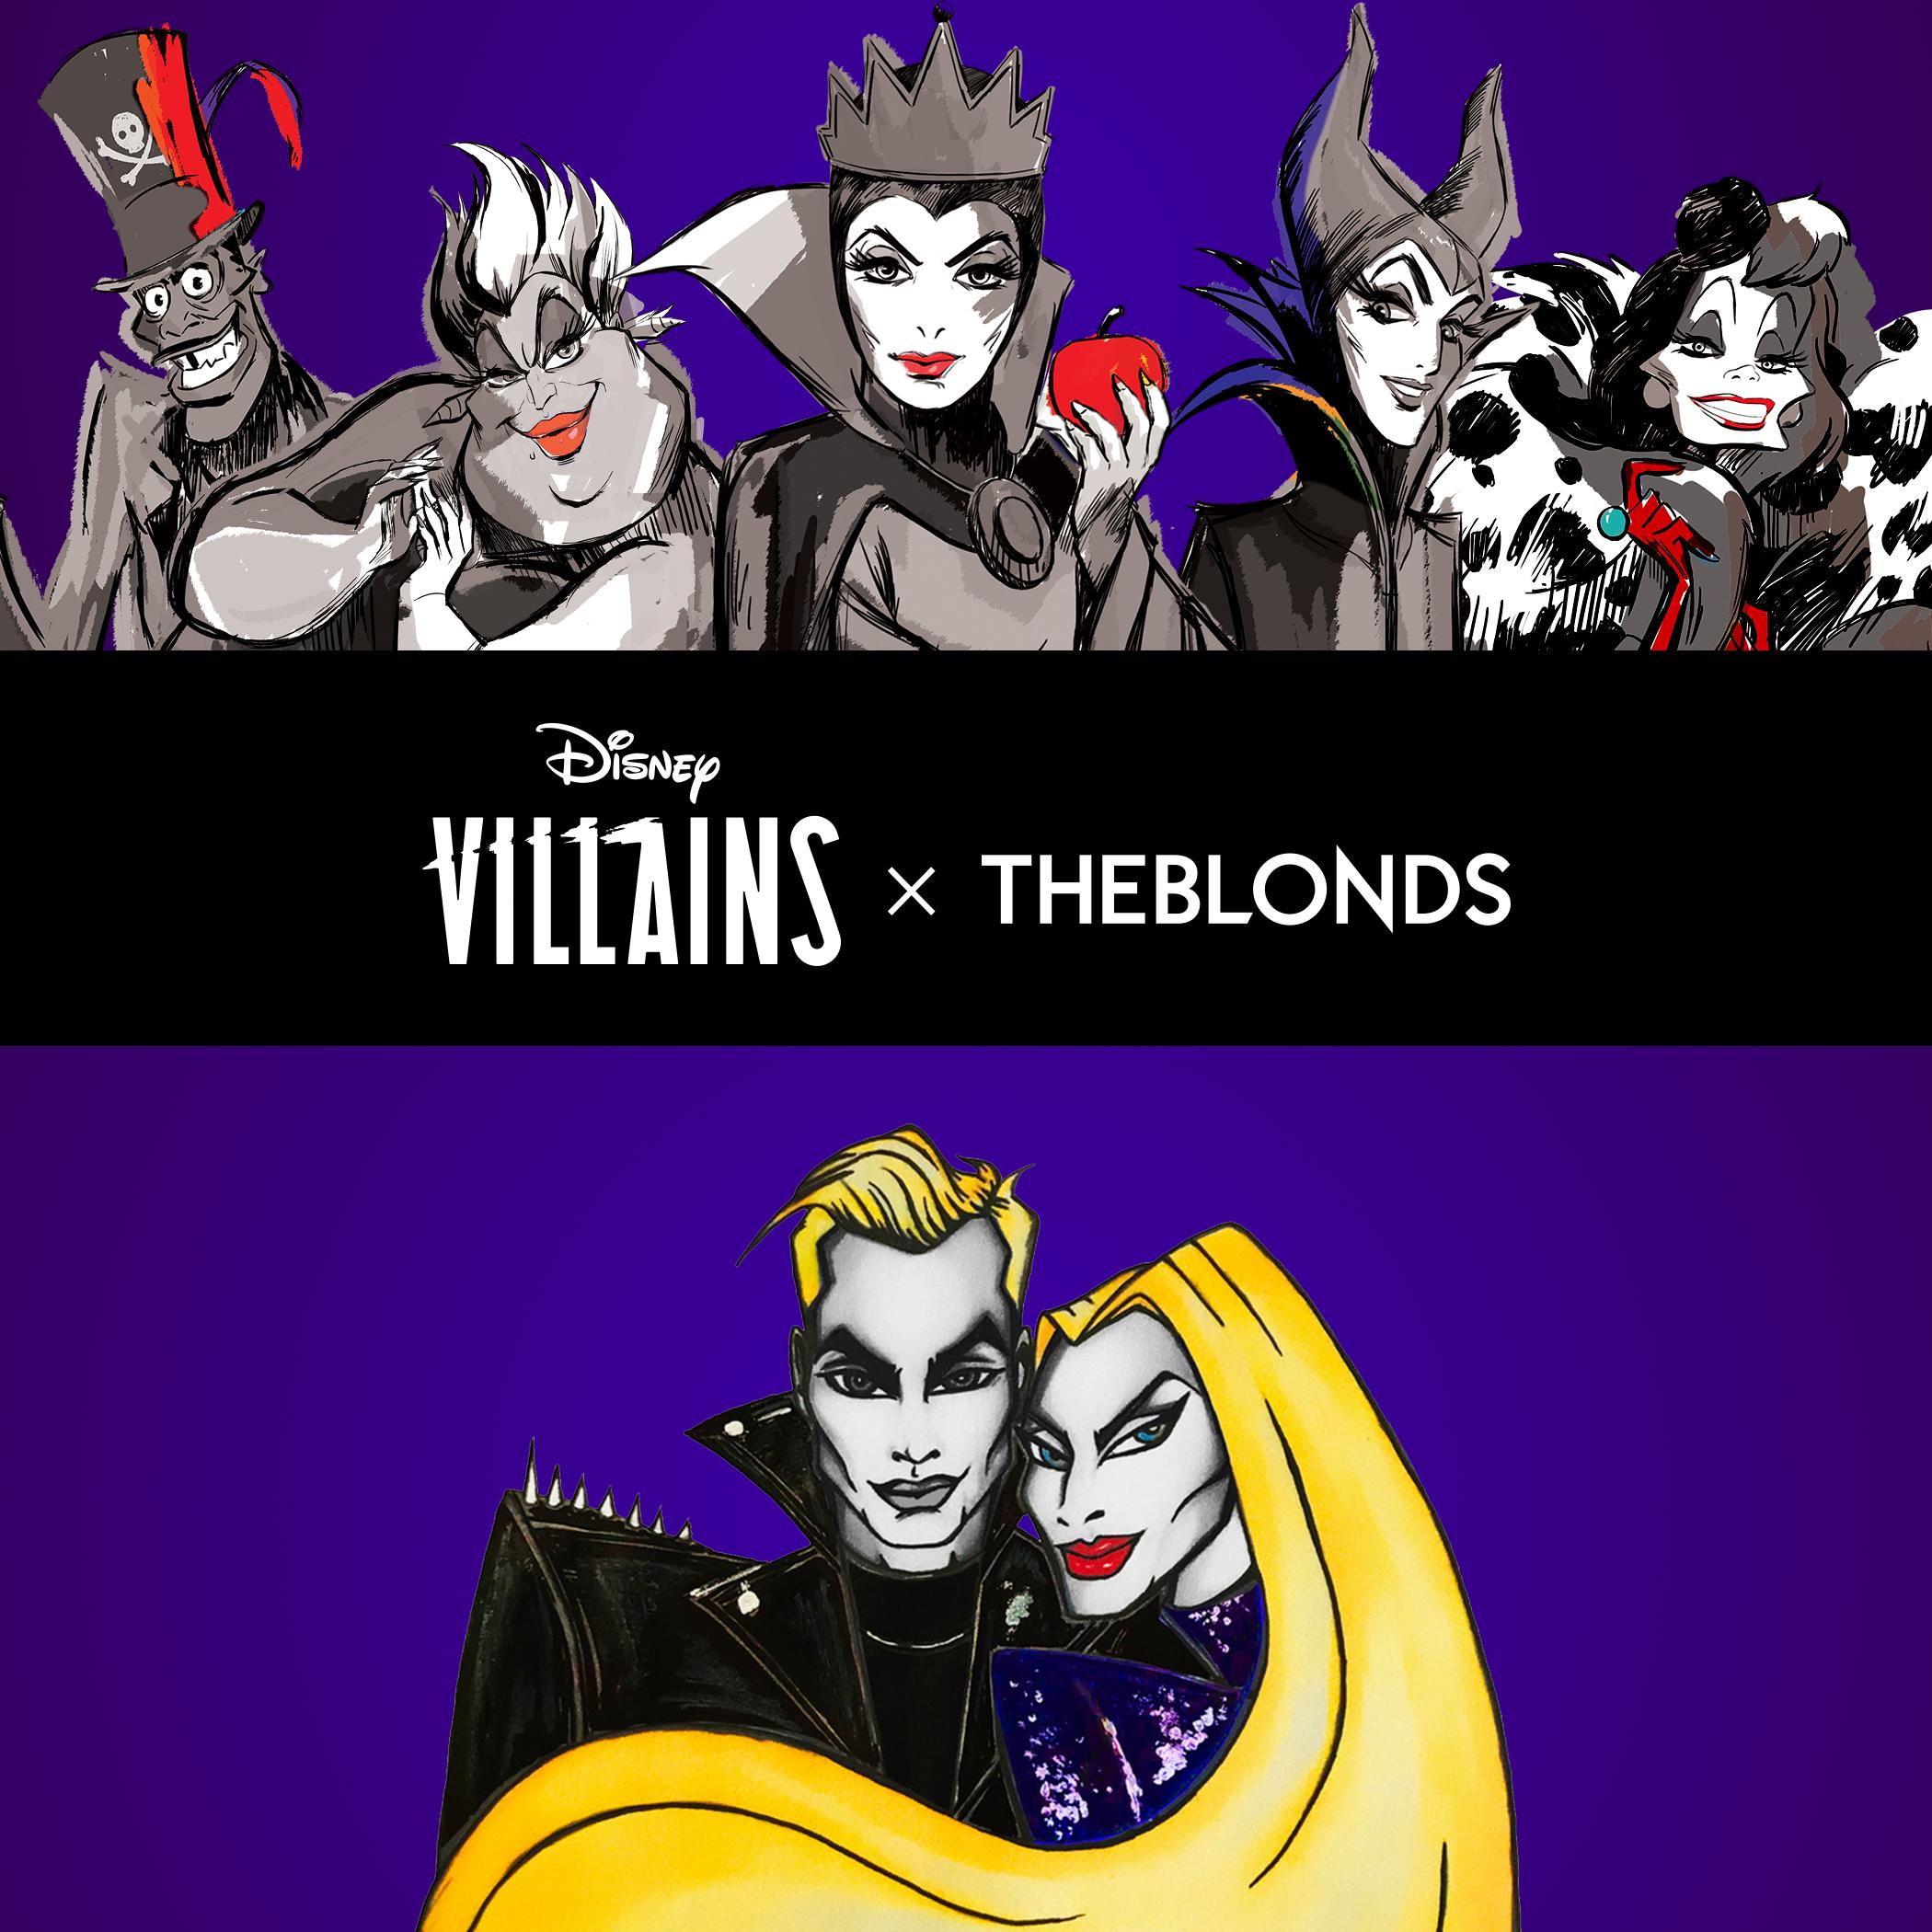 Sketch of Disney Villains x The Blonds